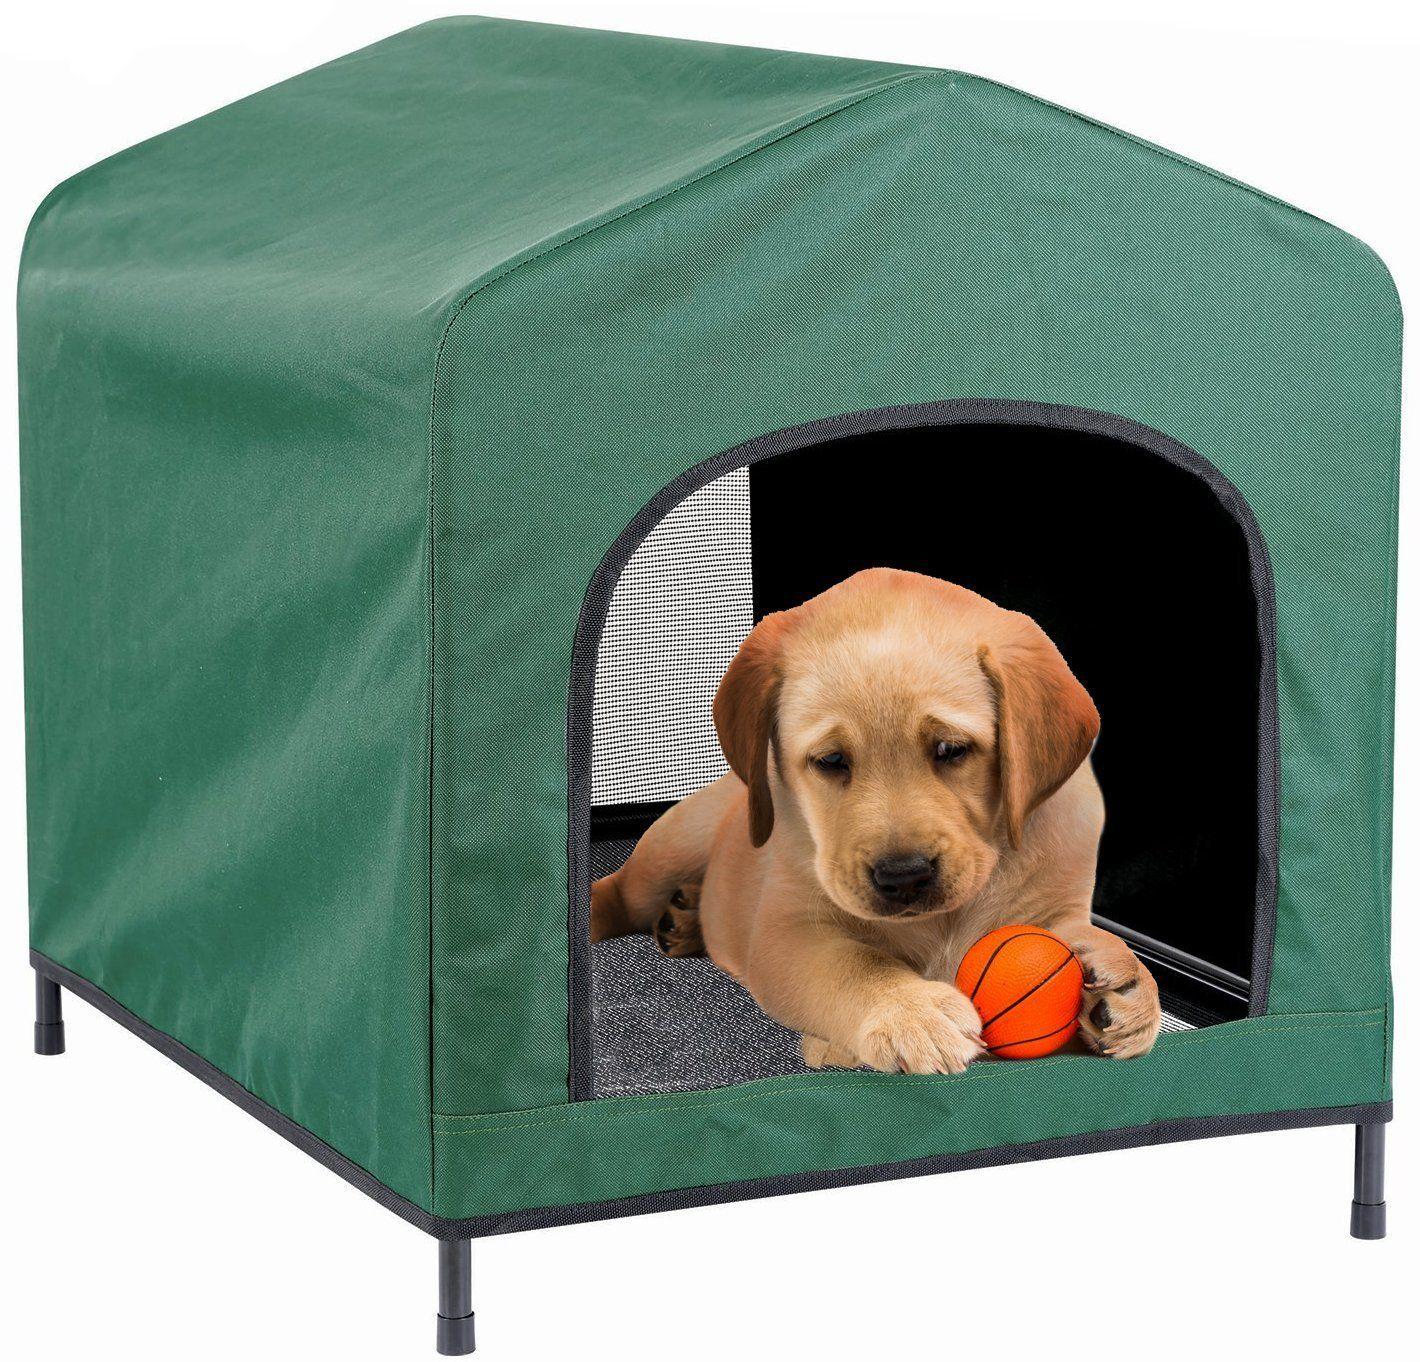 Kleeger Premium Canopy Pet House Retreat Waterproof